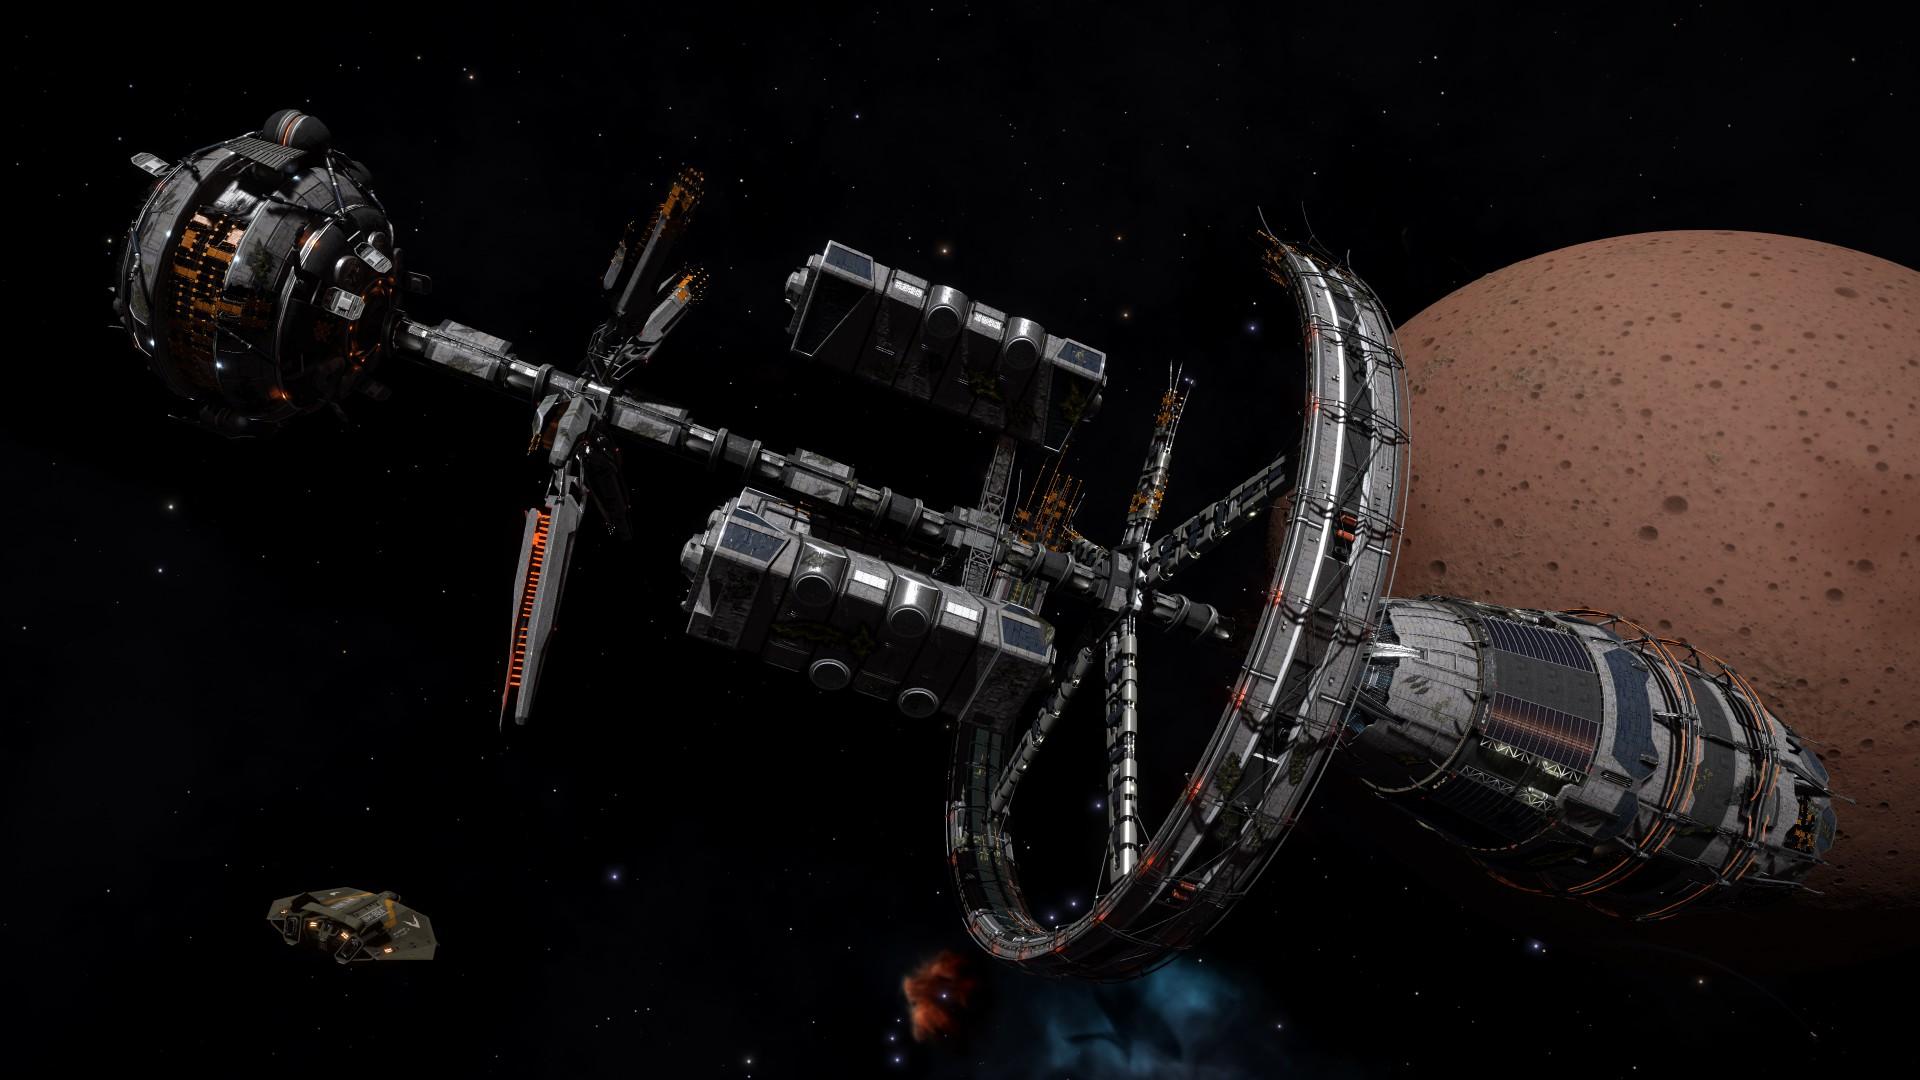 General 1920x1080 Elite: Dangerous space Space Simulator spaceship space station Starport Orbis Station Damaged Starport ASP Explorer